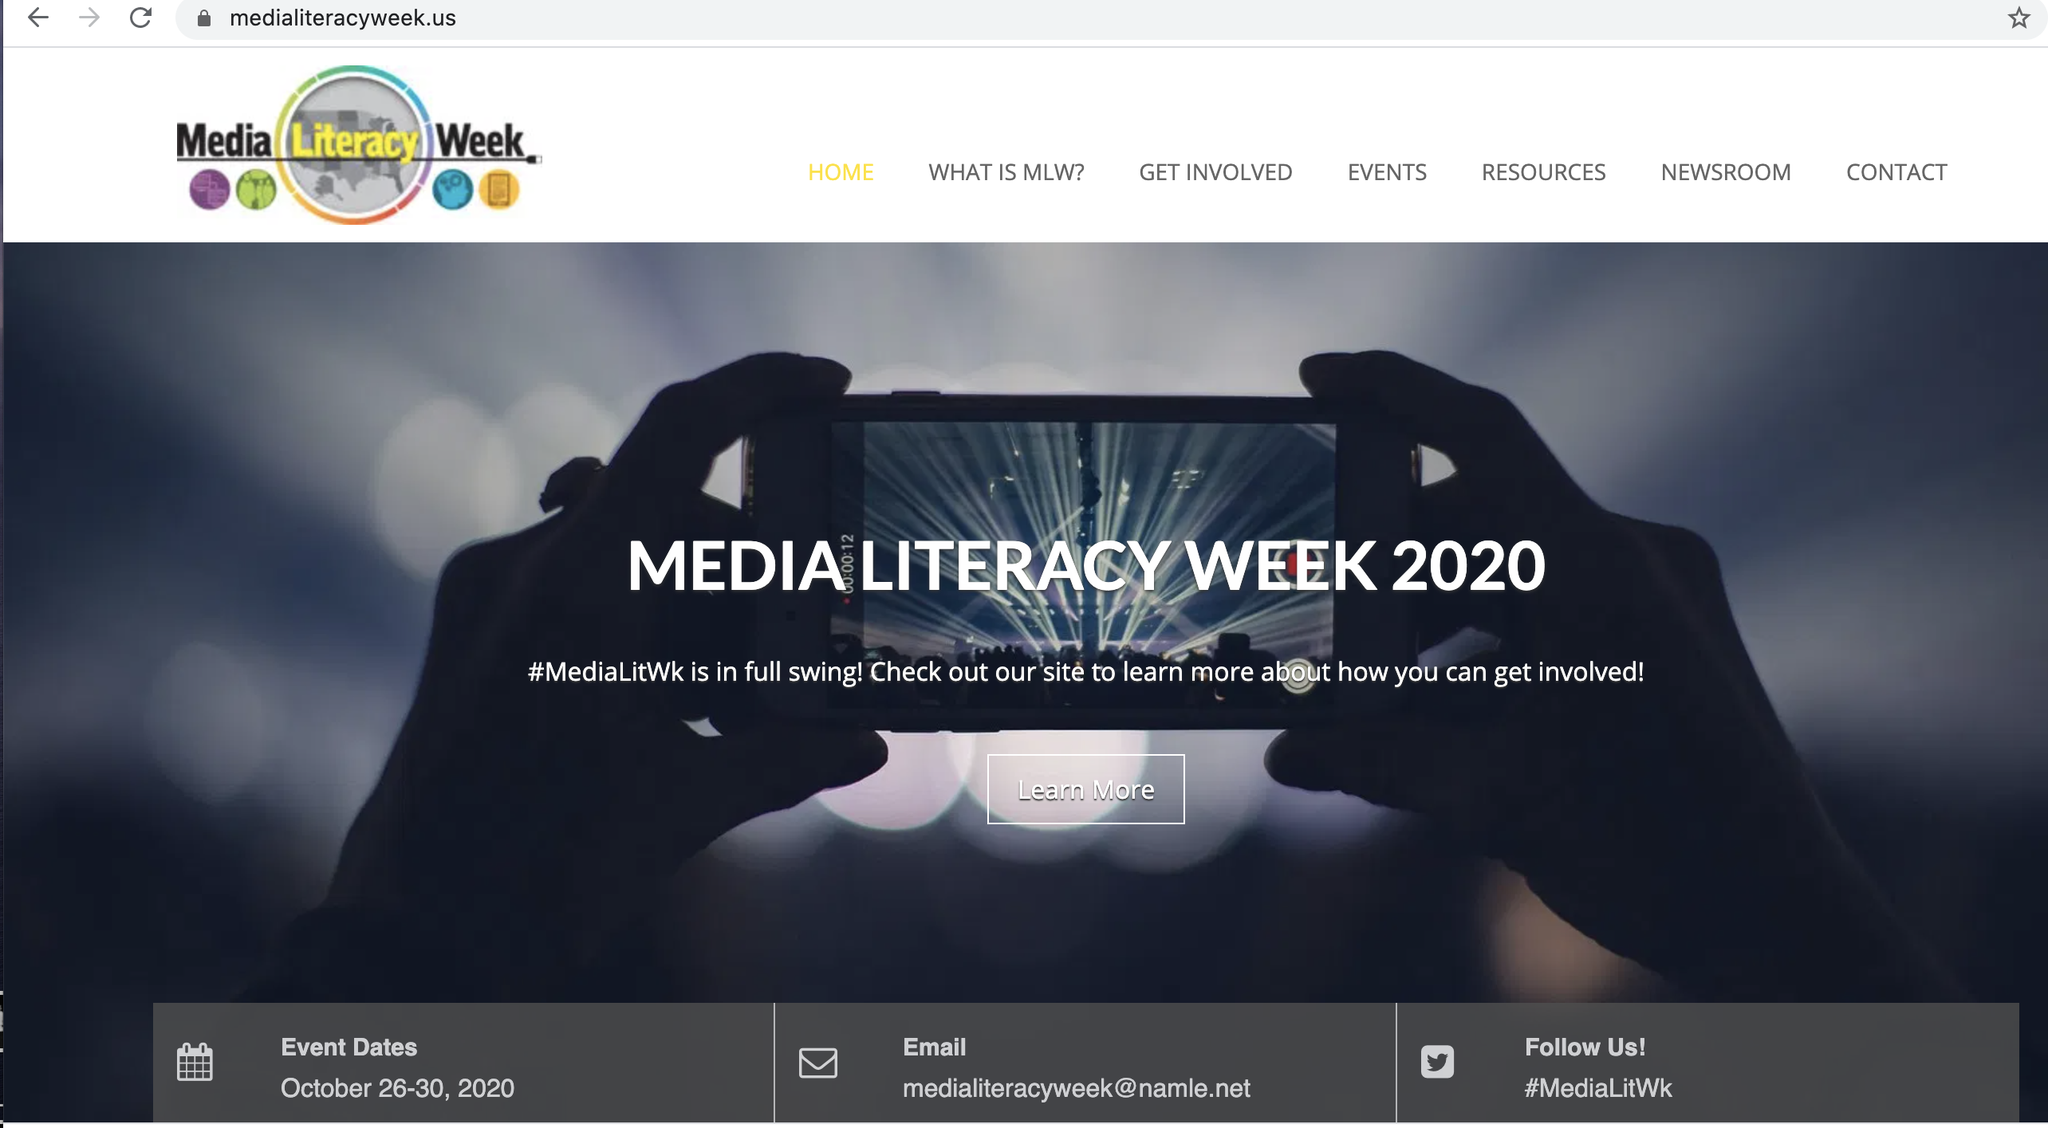 Media Literacy Week is Oct. 26-30, 2020